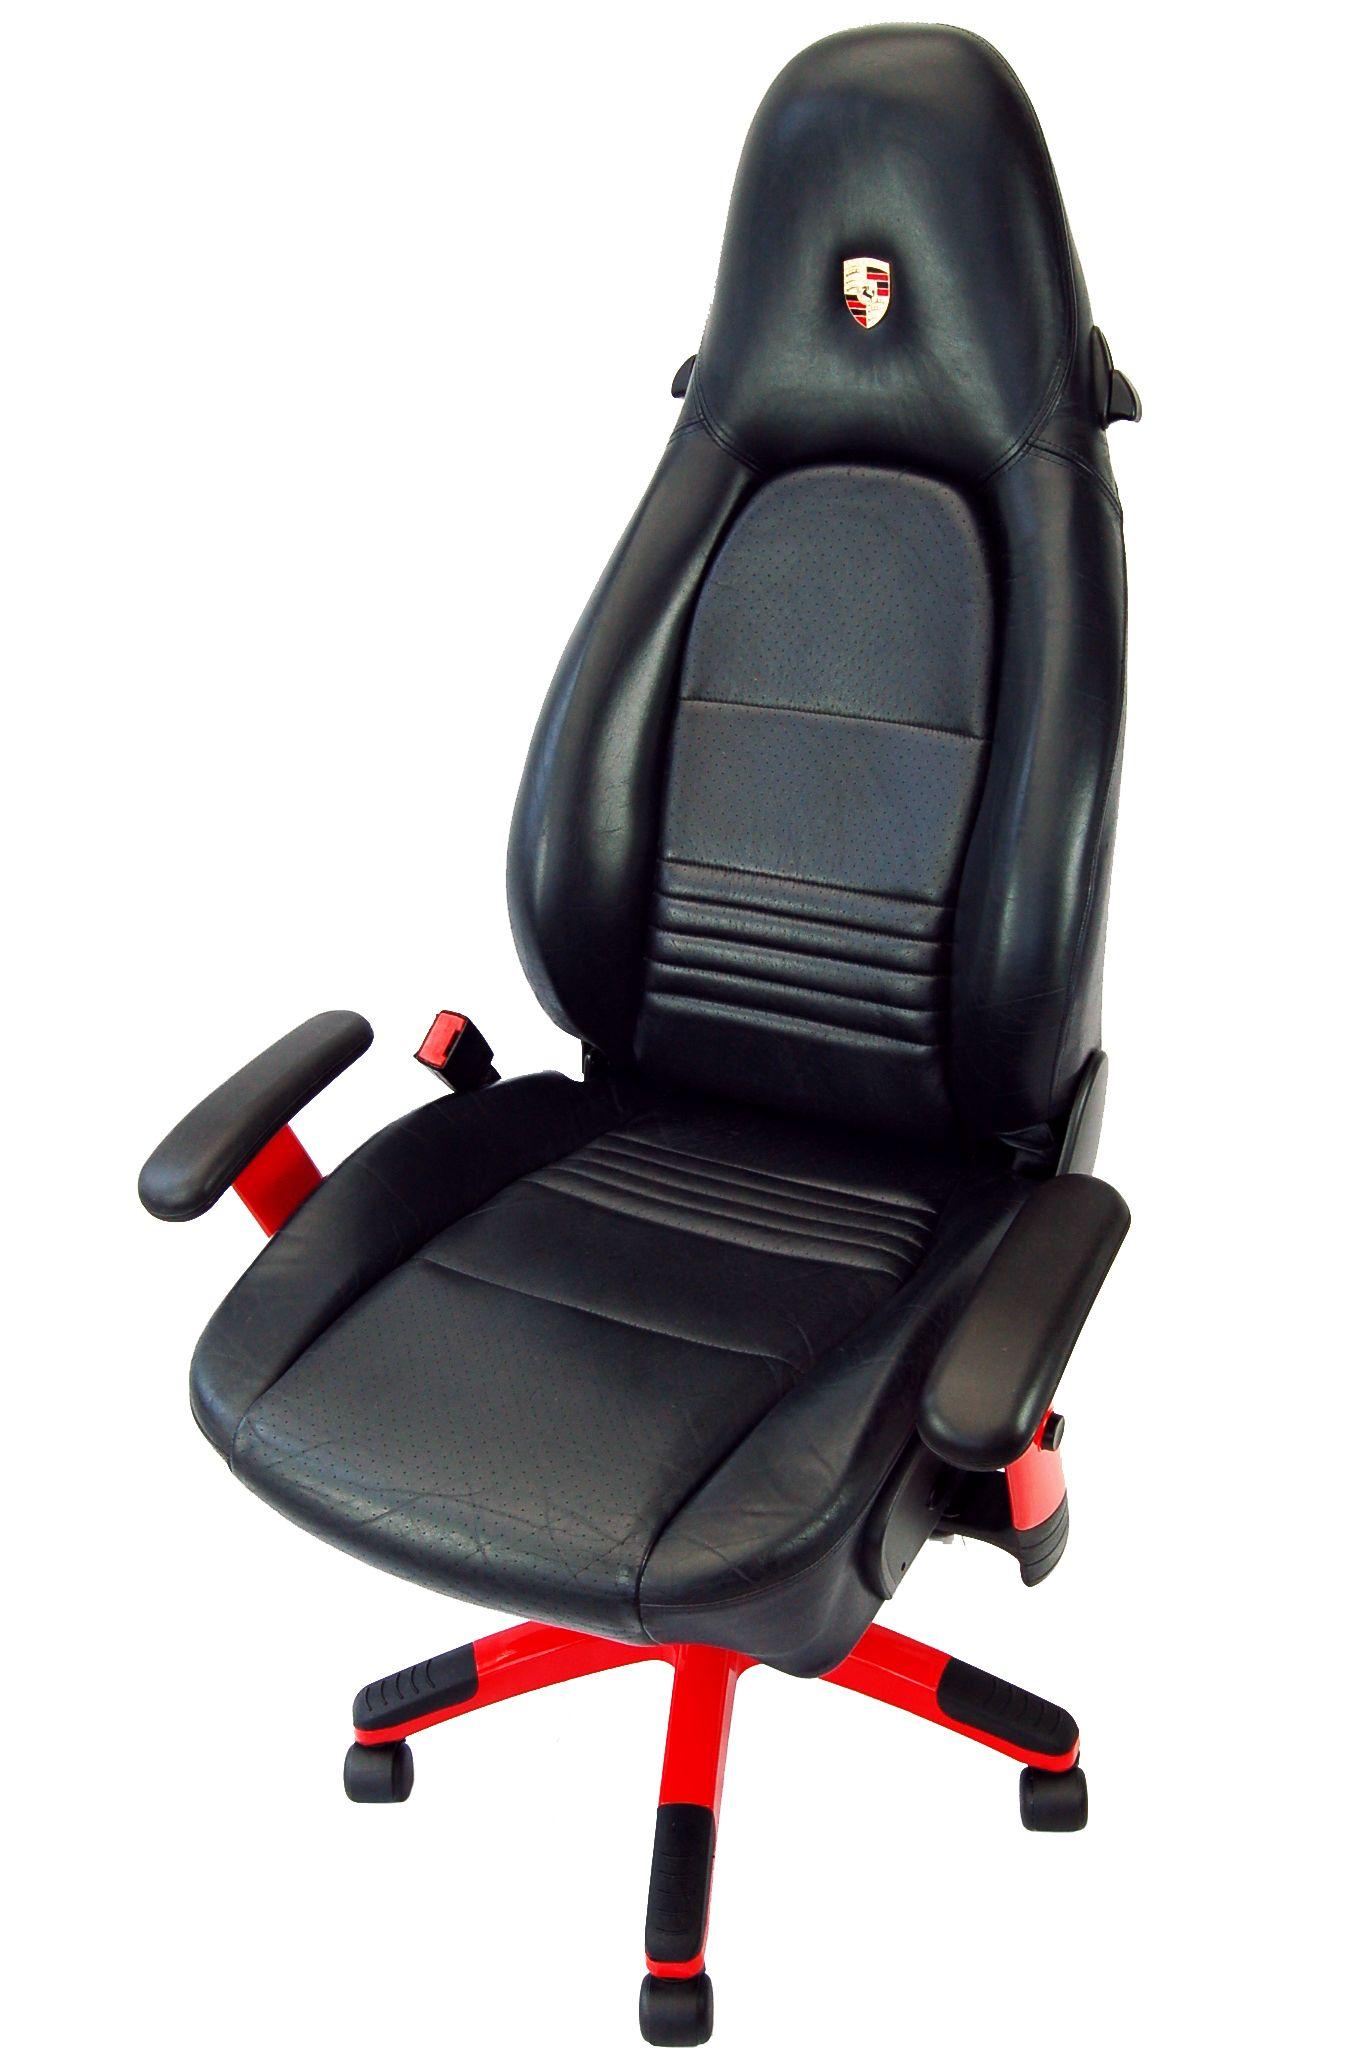 Porsche office chair Office furniture collections, Best